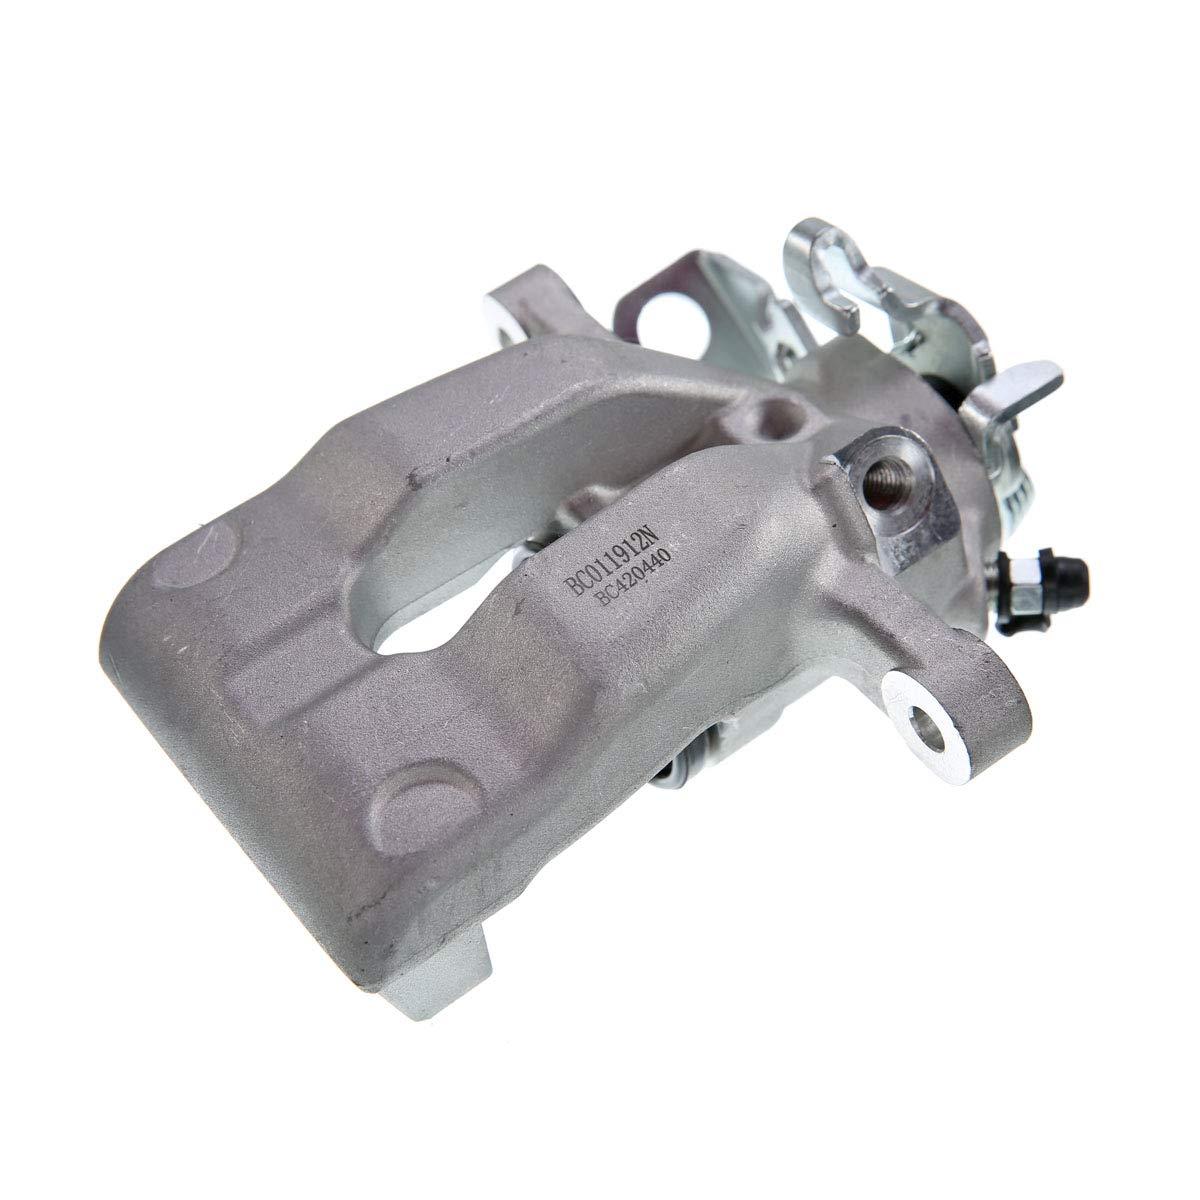 542044 Brake Caliper Rear Right for Astra G Meriva Astra MK 4 2001-2009